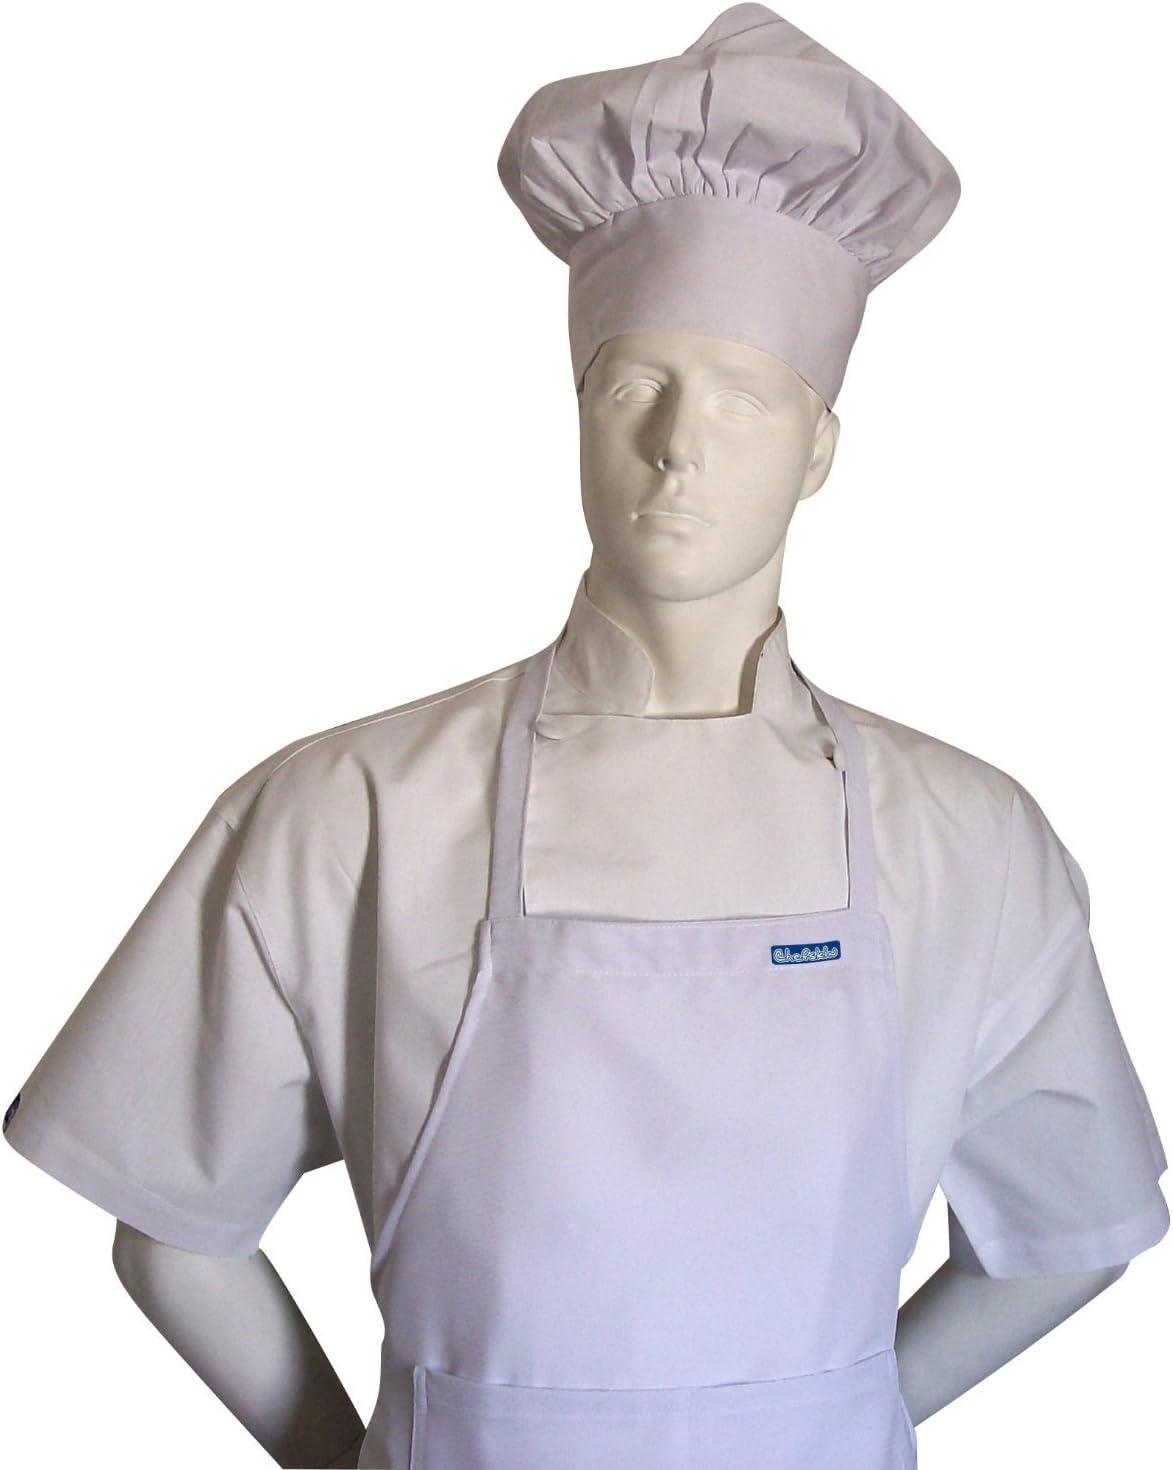 Chefskin Chef White Adult Chef Set (Apron+hat) Adjustable, Ultra Lite Fabric 71IU7GQ799L